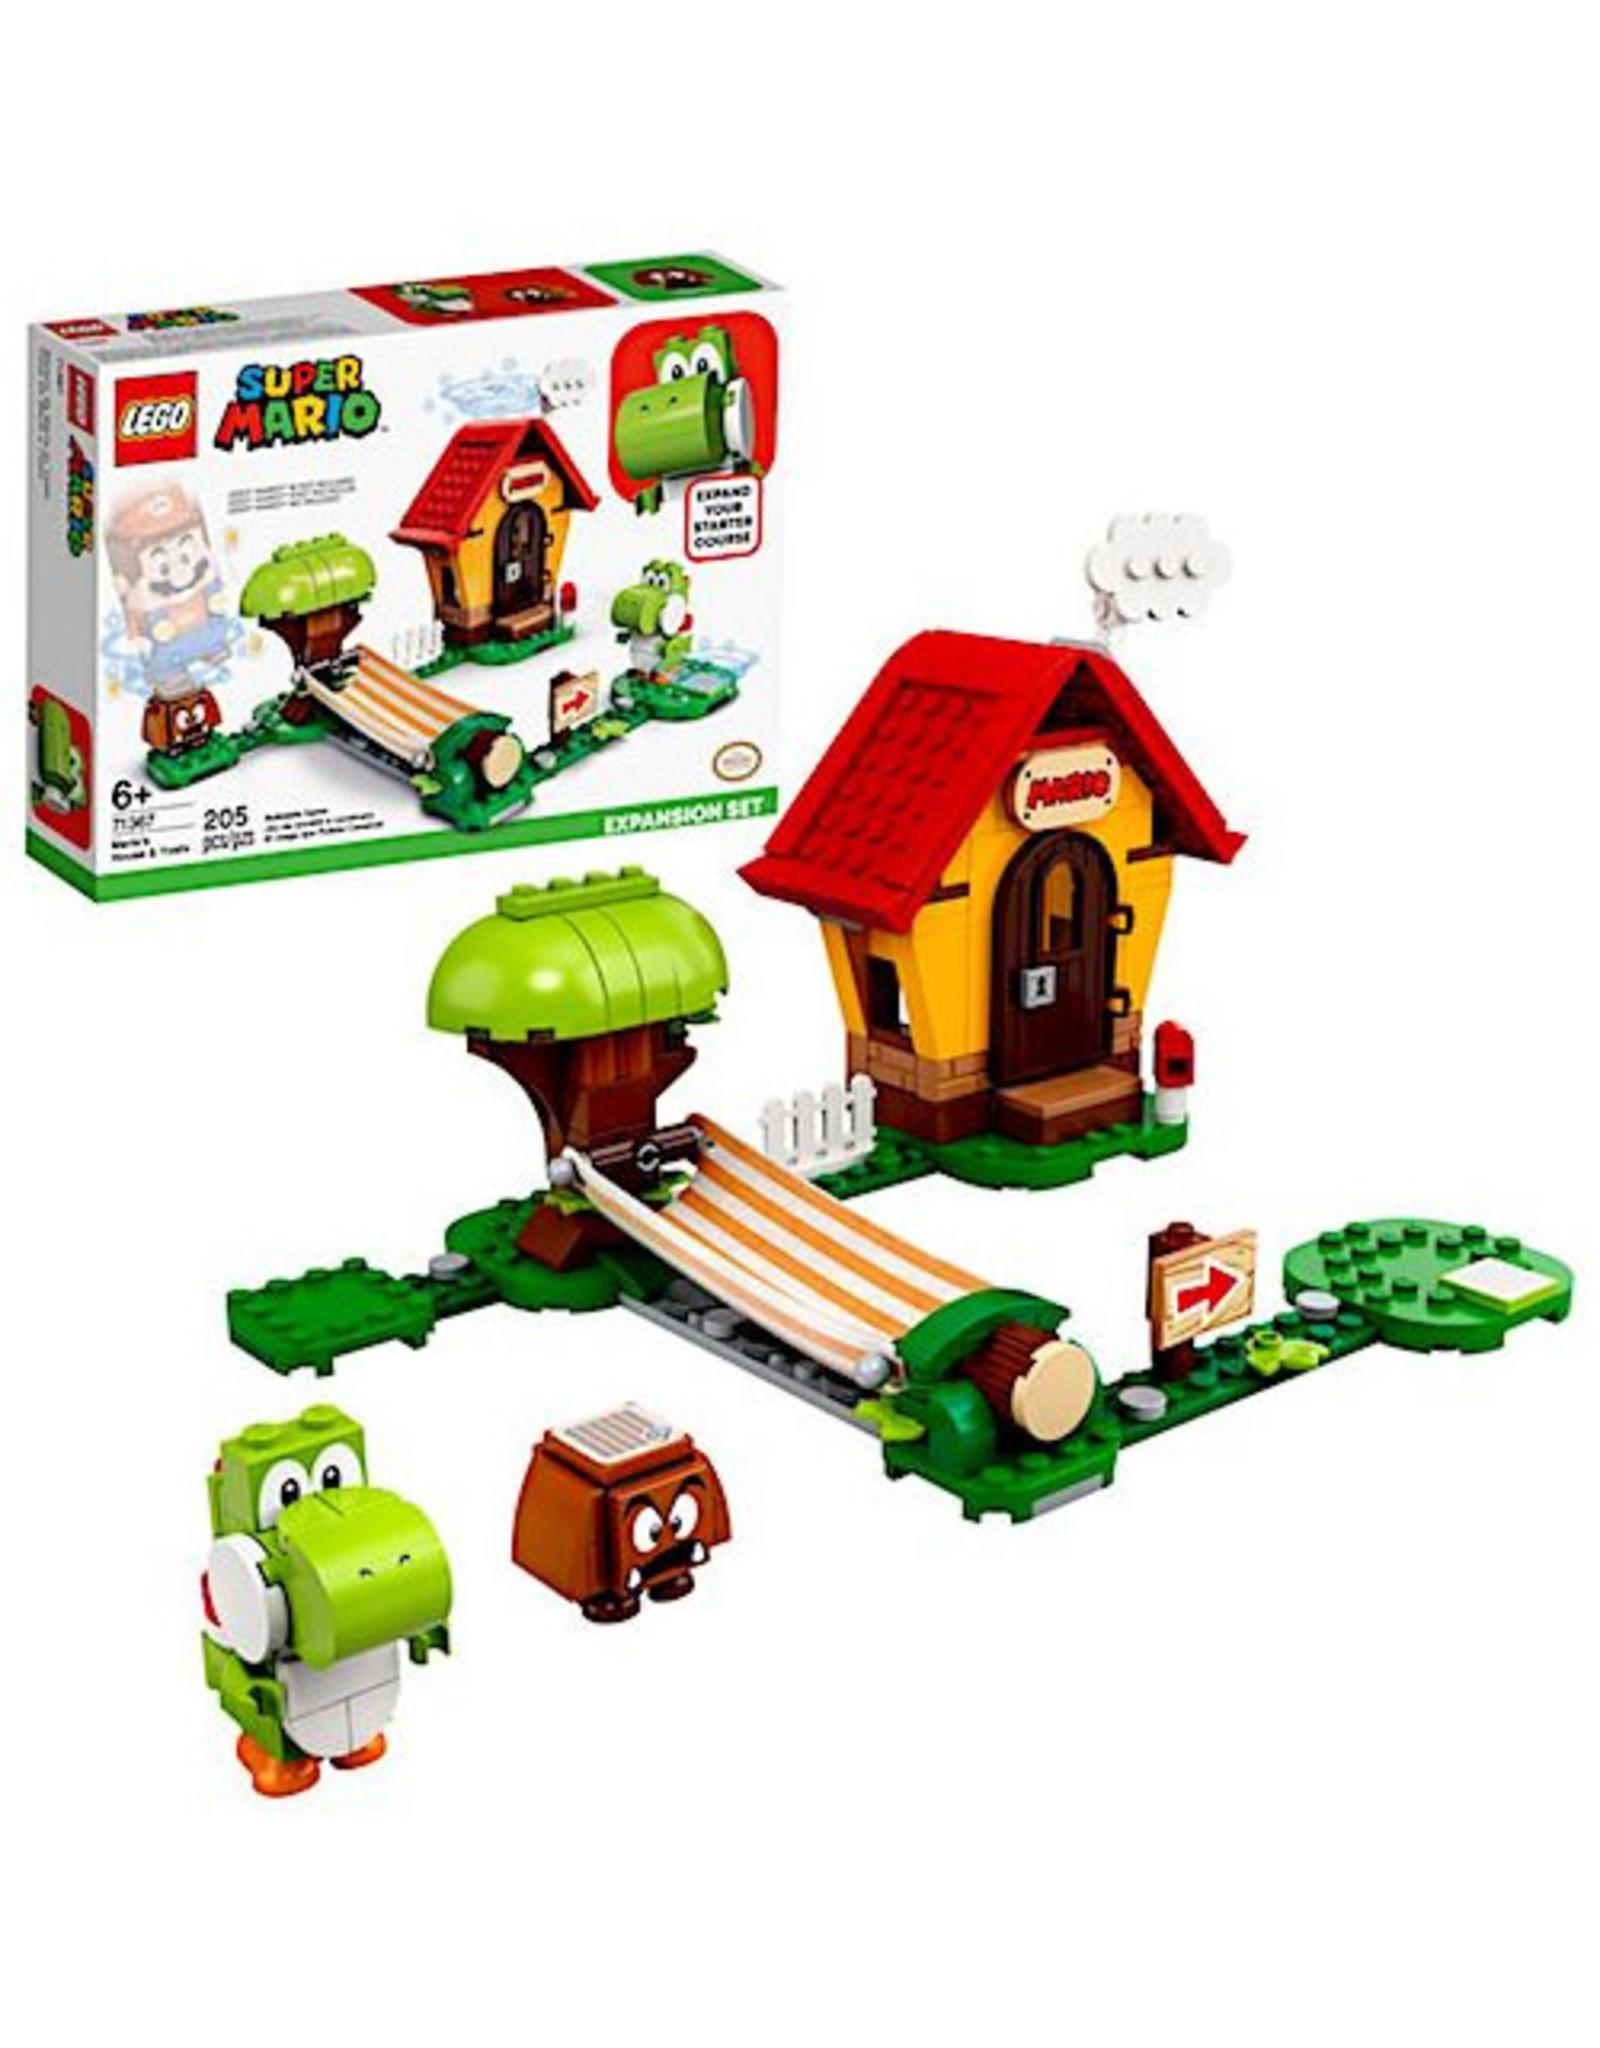 Lego Mario's House and Yoshi Expansion Set